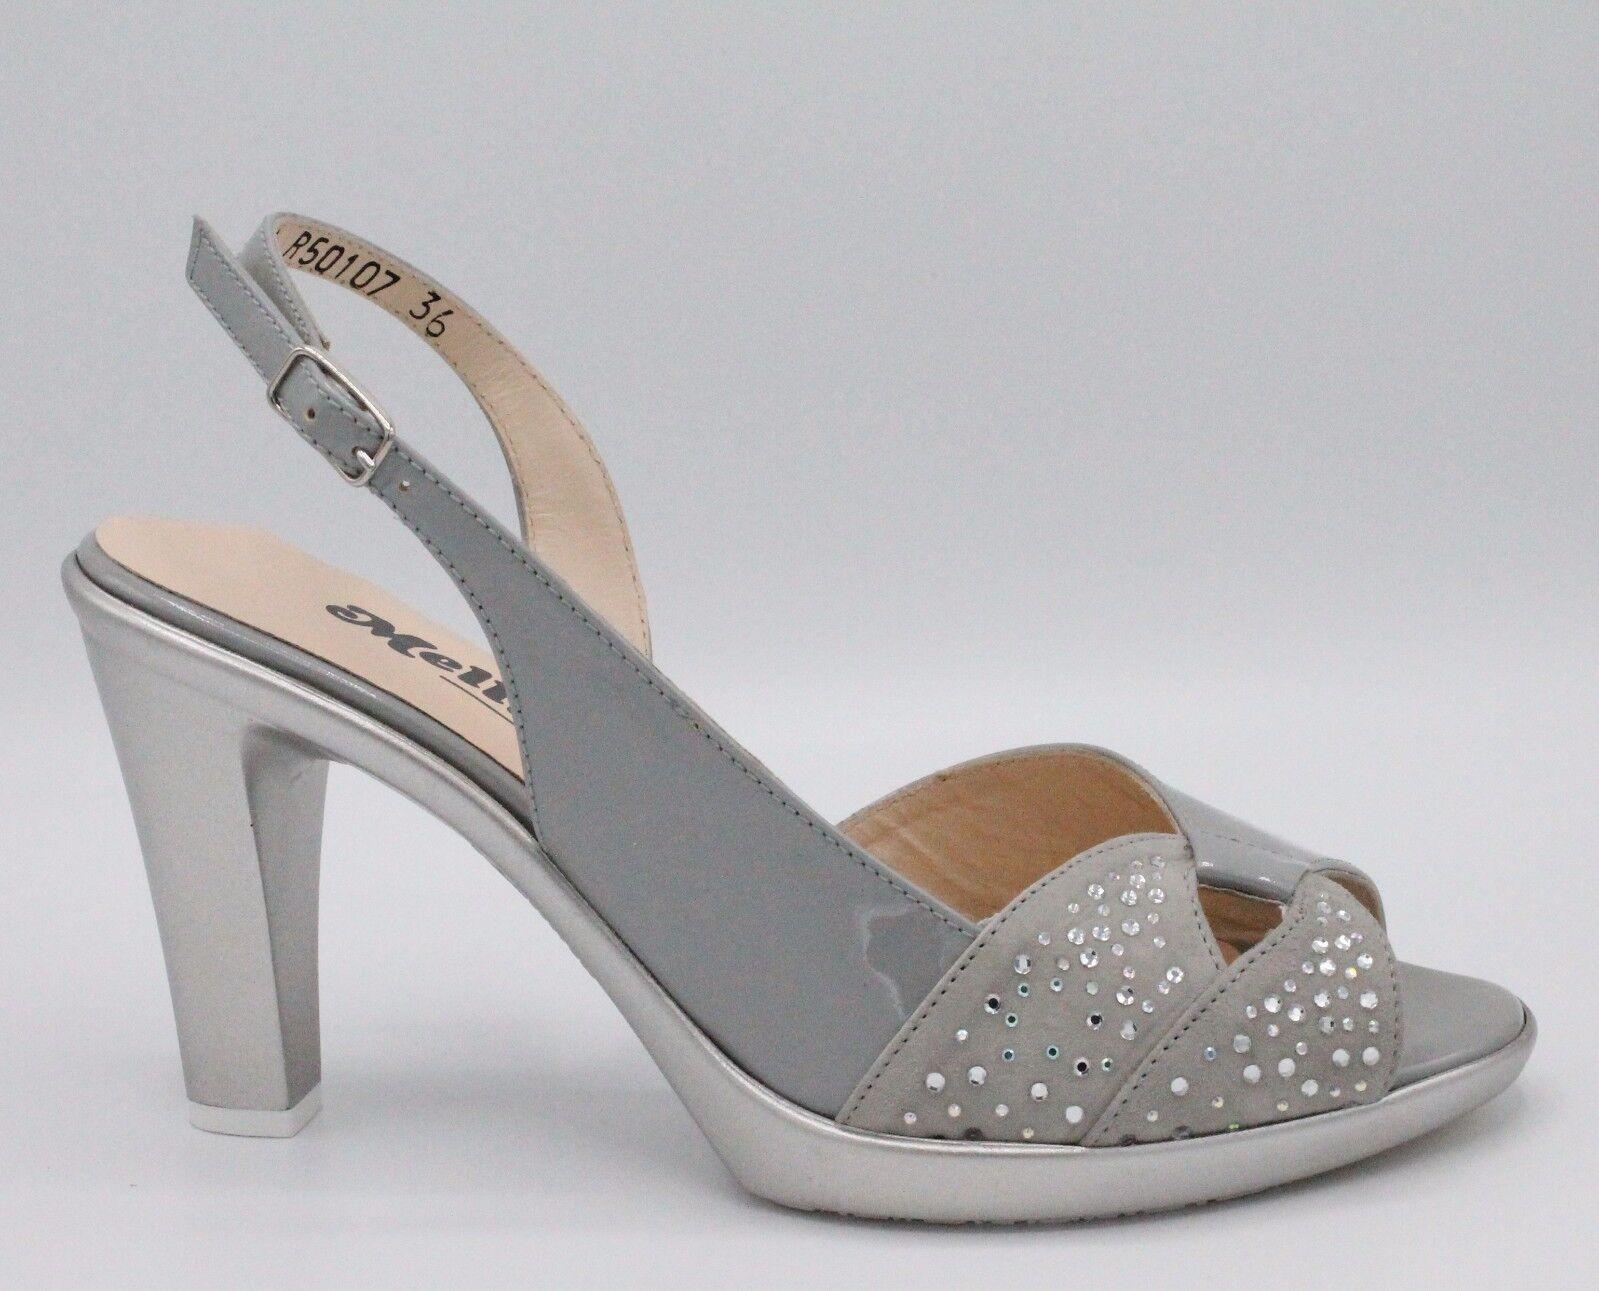 MELLUSO Sandali donna eleganti in pelle vernice argentoo strass tacco 8cm R50107